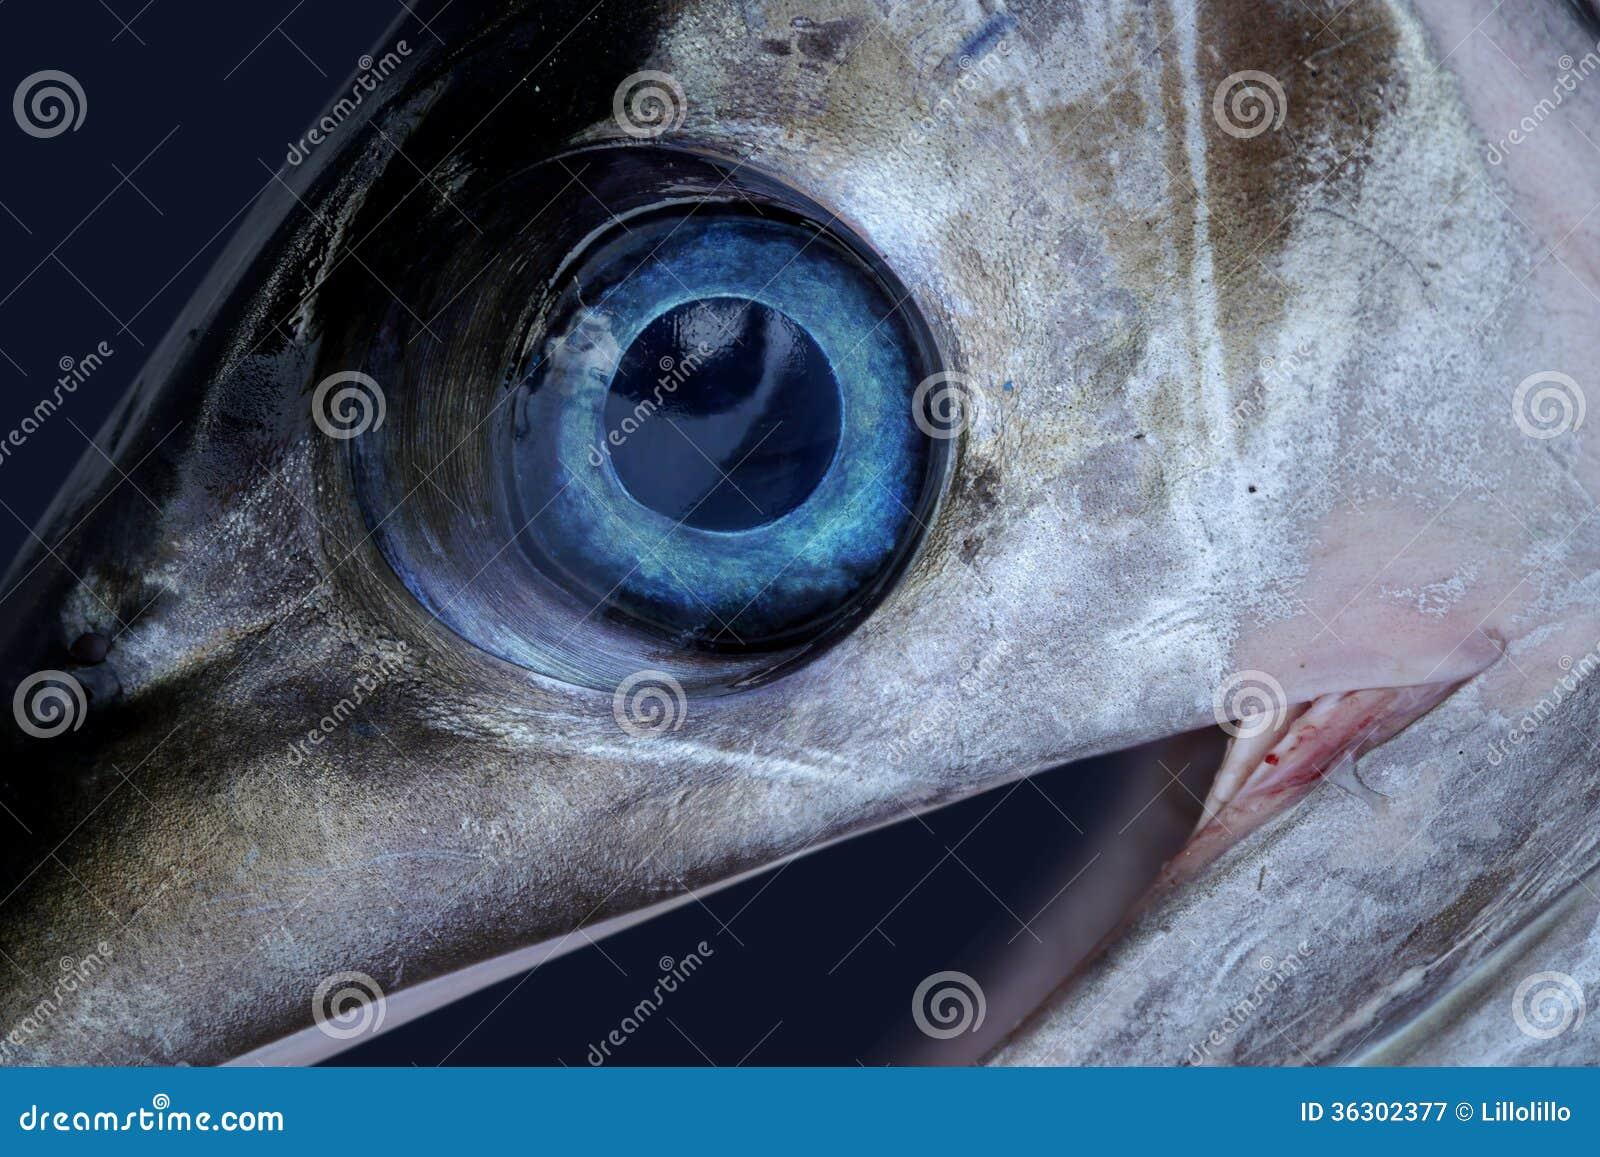 Sword Fish Eye Royalty Free Stock Photography - Image: 36302377